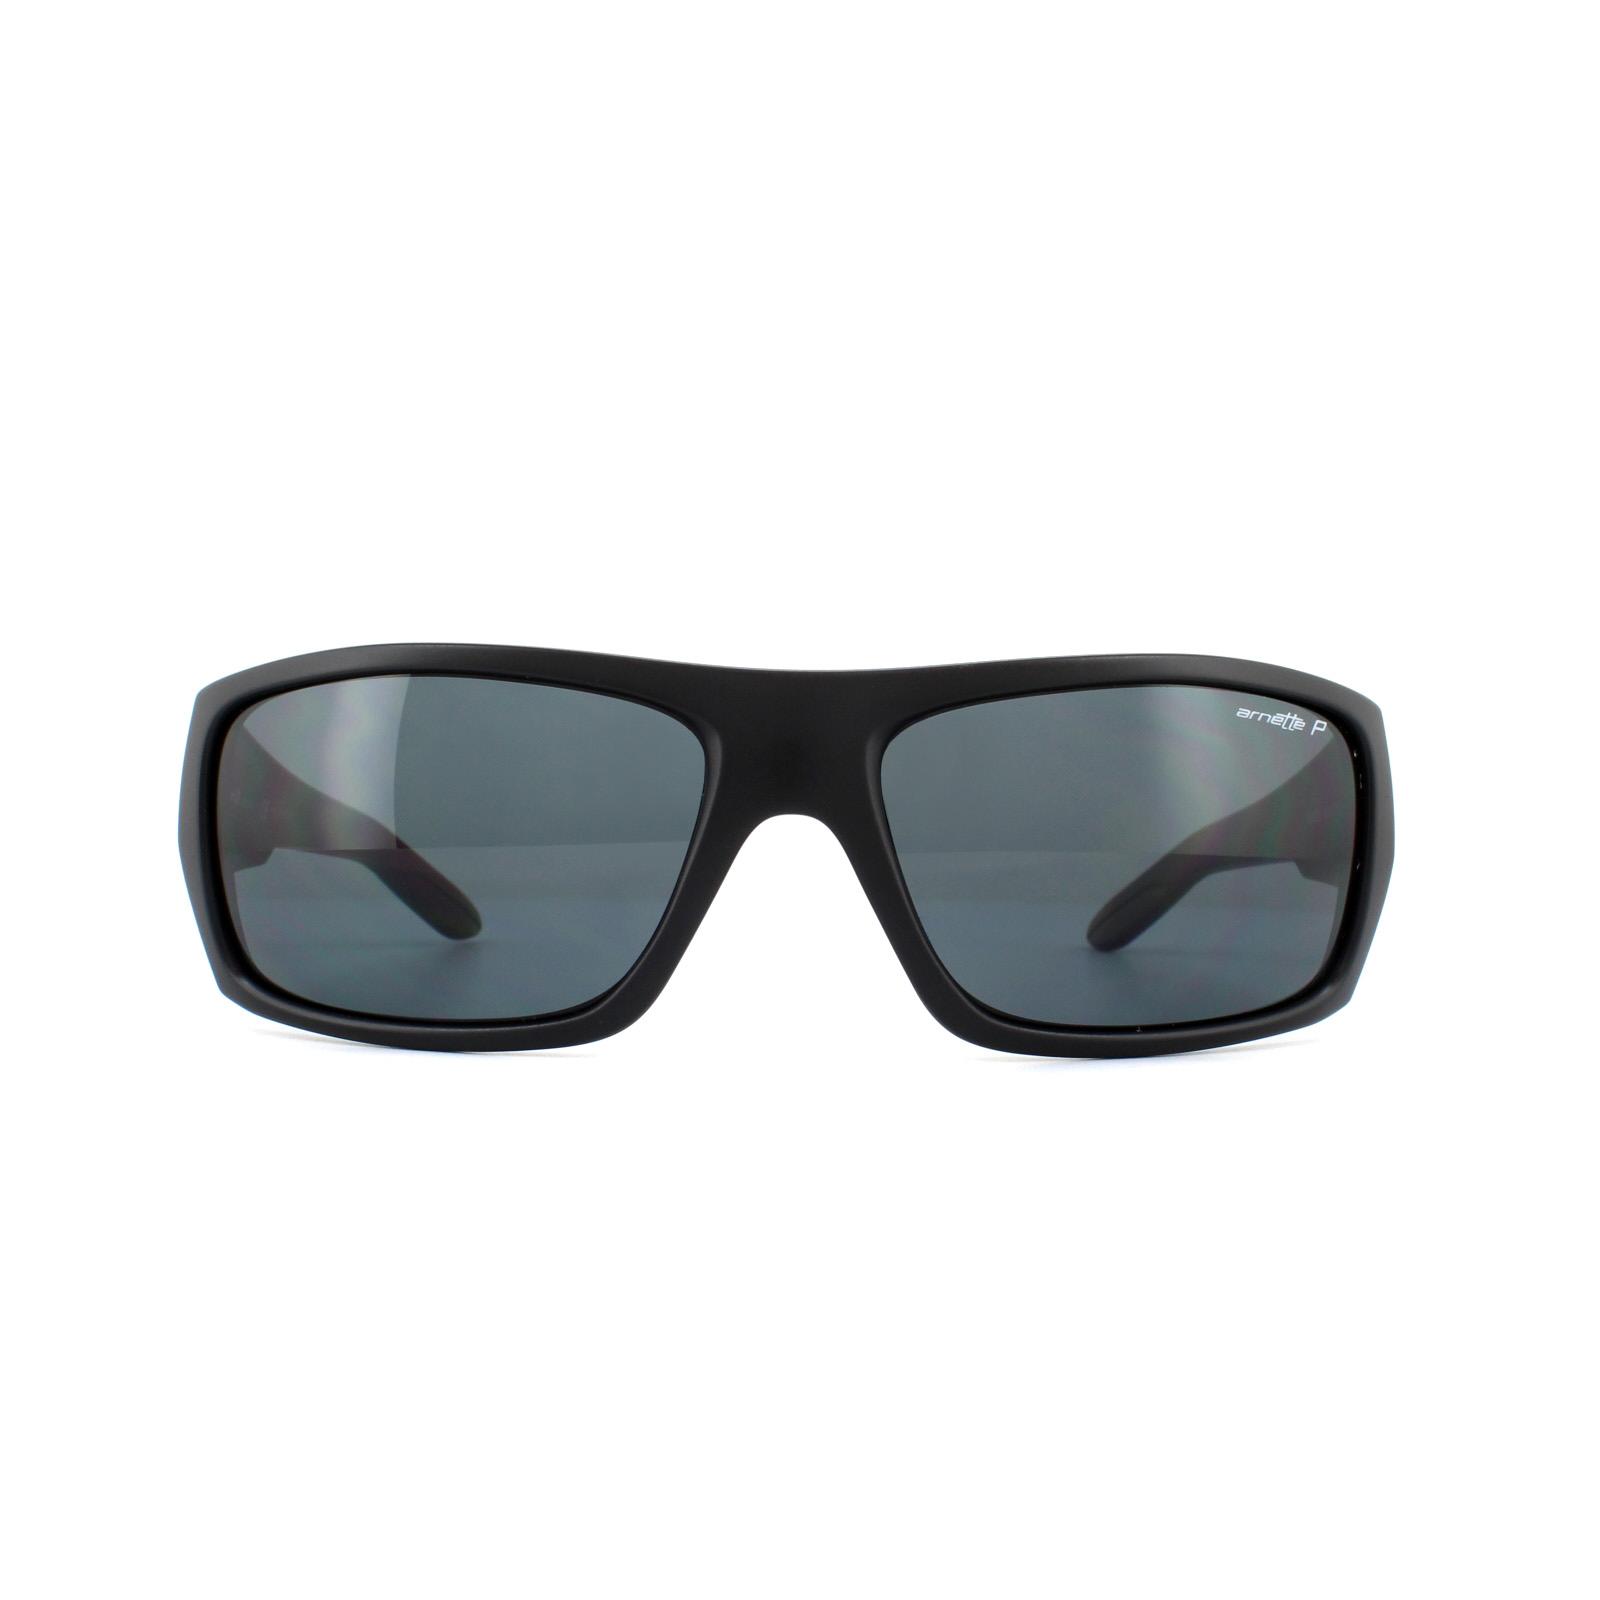 68a2c56bab71 Sentinel Arnette Sunglasses 4164 Munson 01 81 Black Grey Polarized